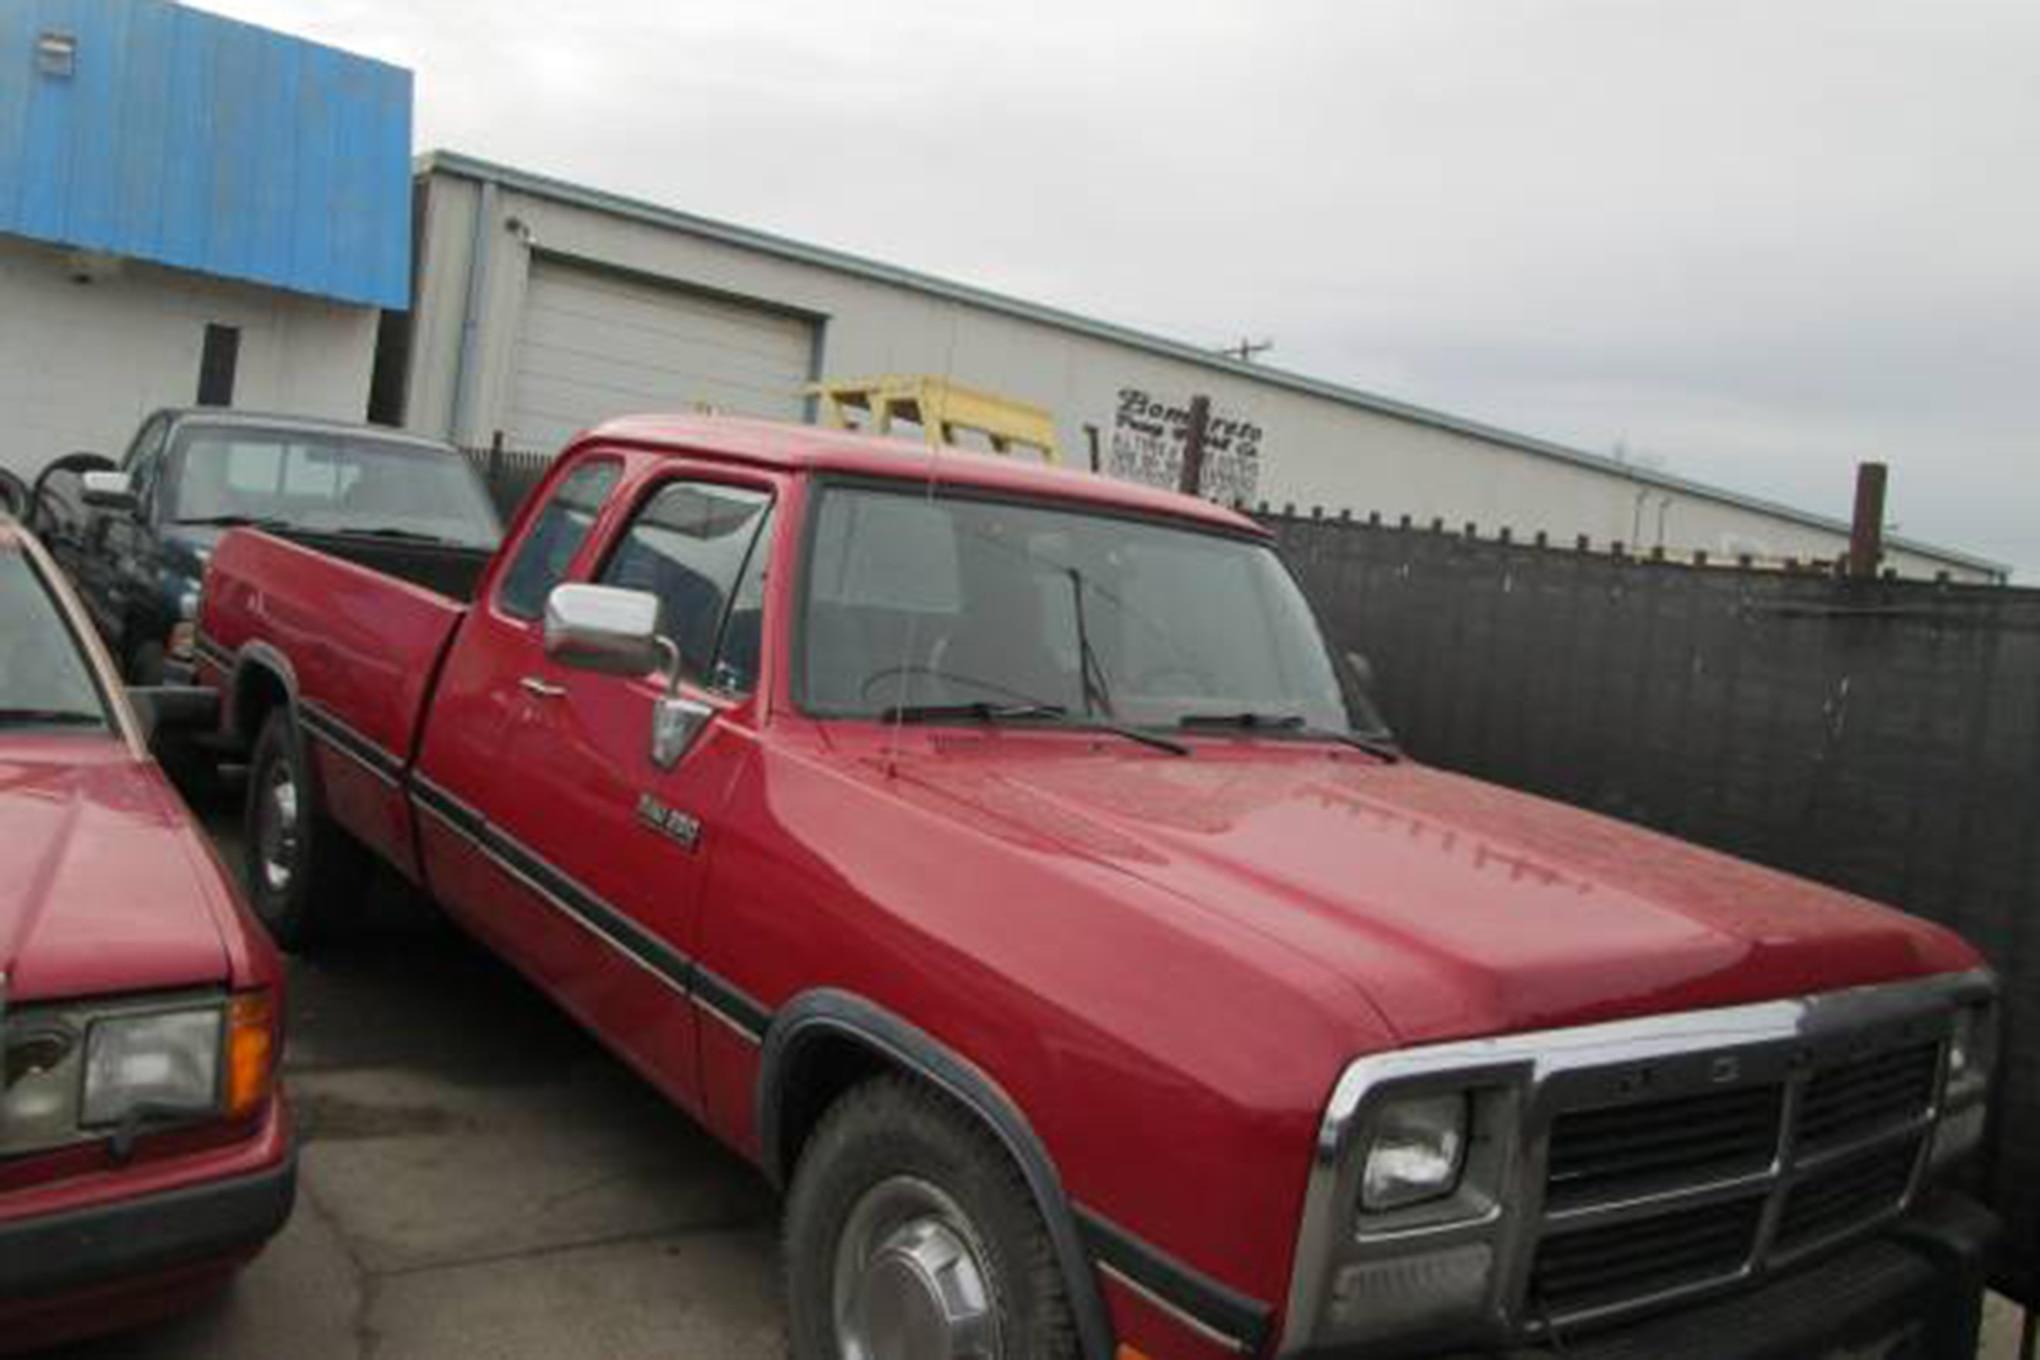 Best Diesel Deals on Craigslist: Denver